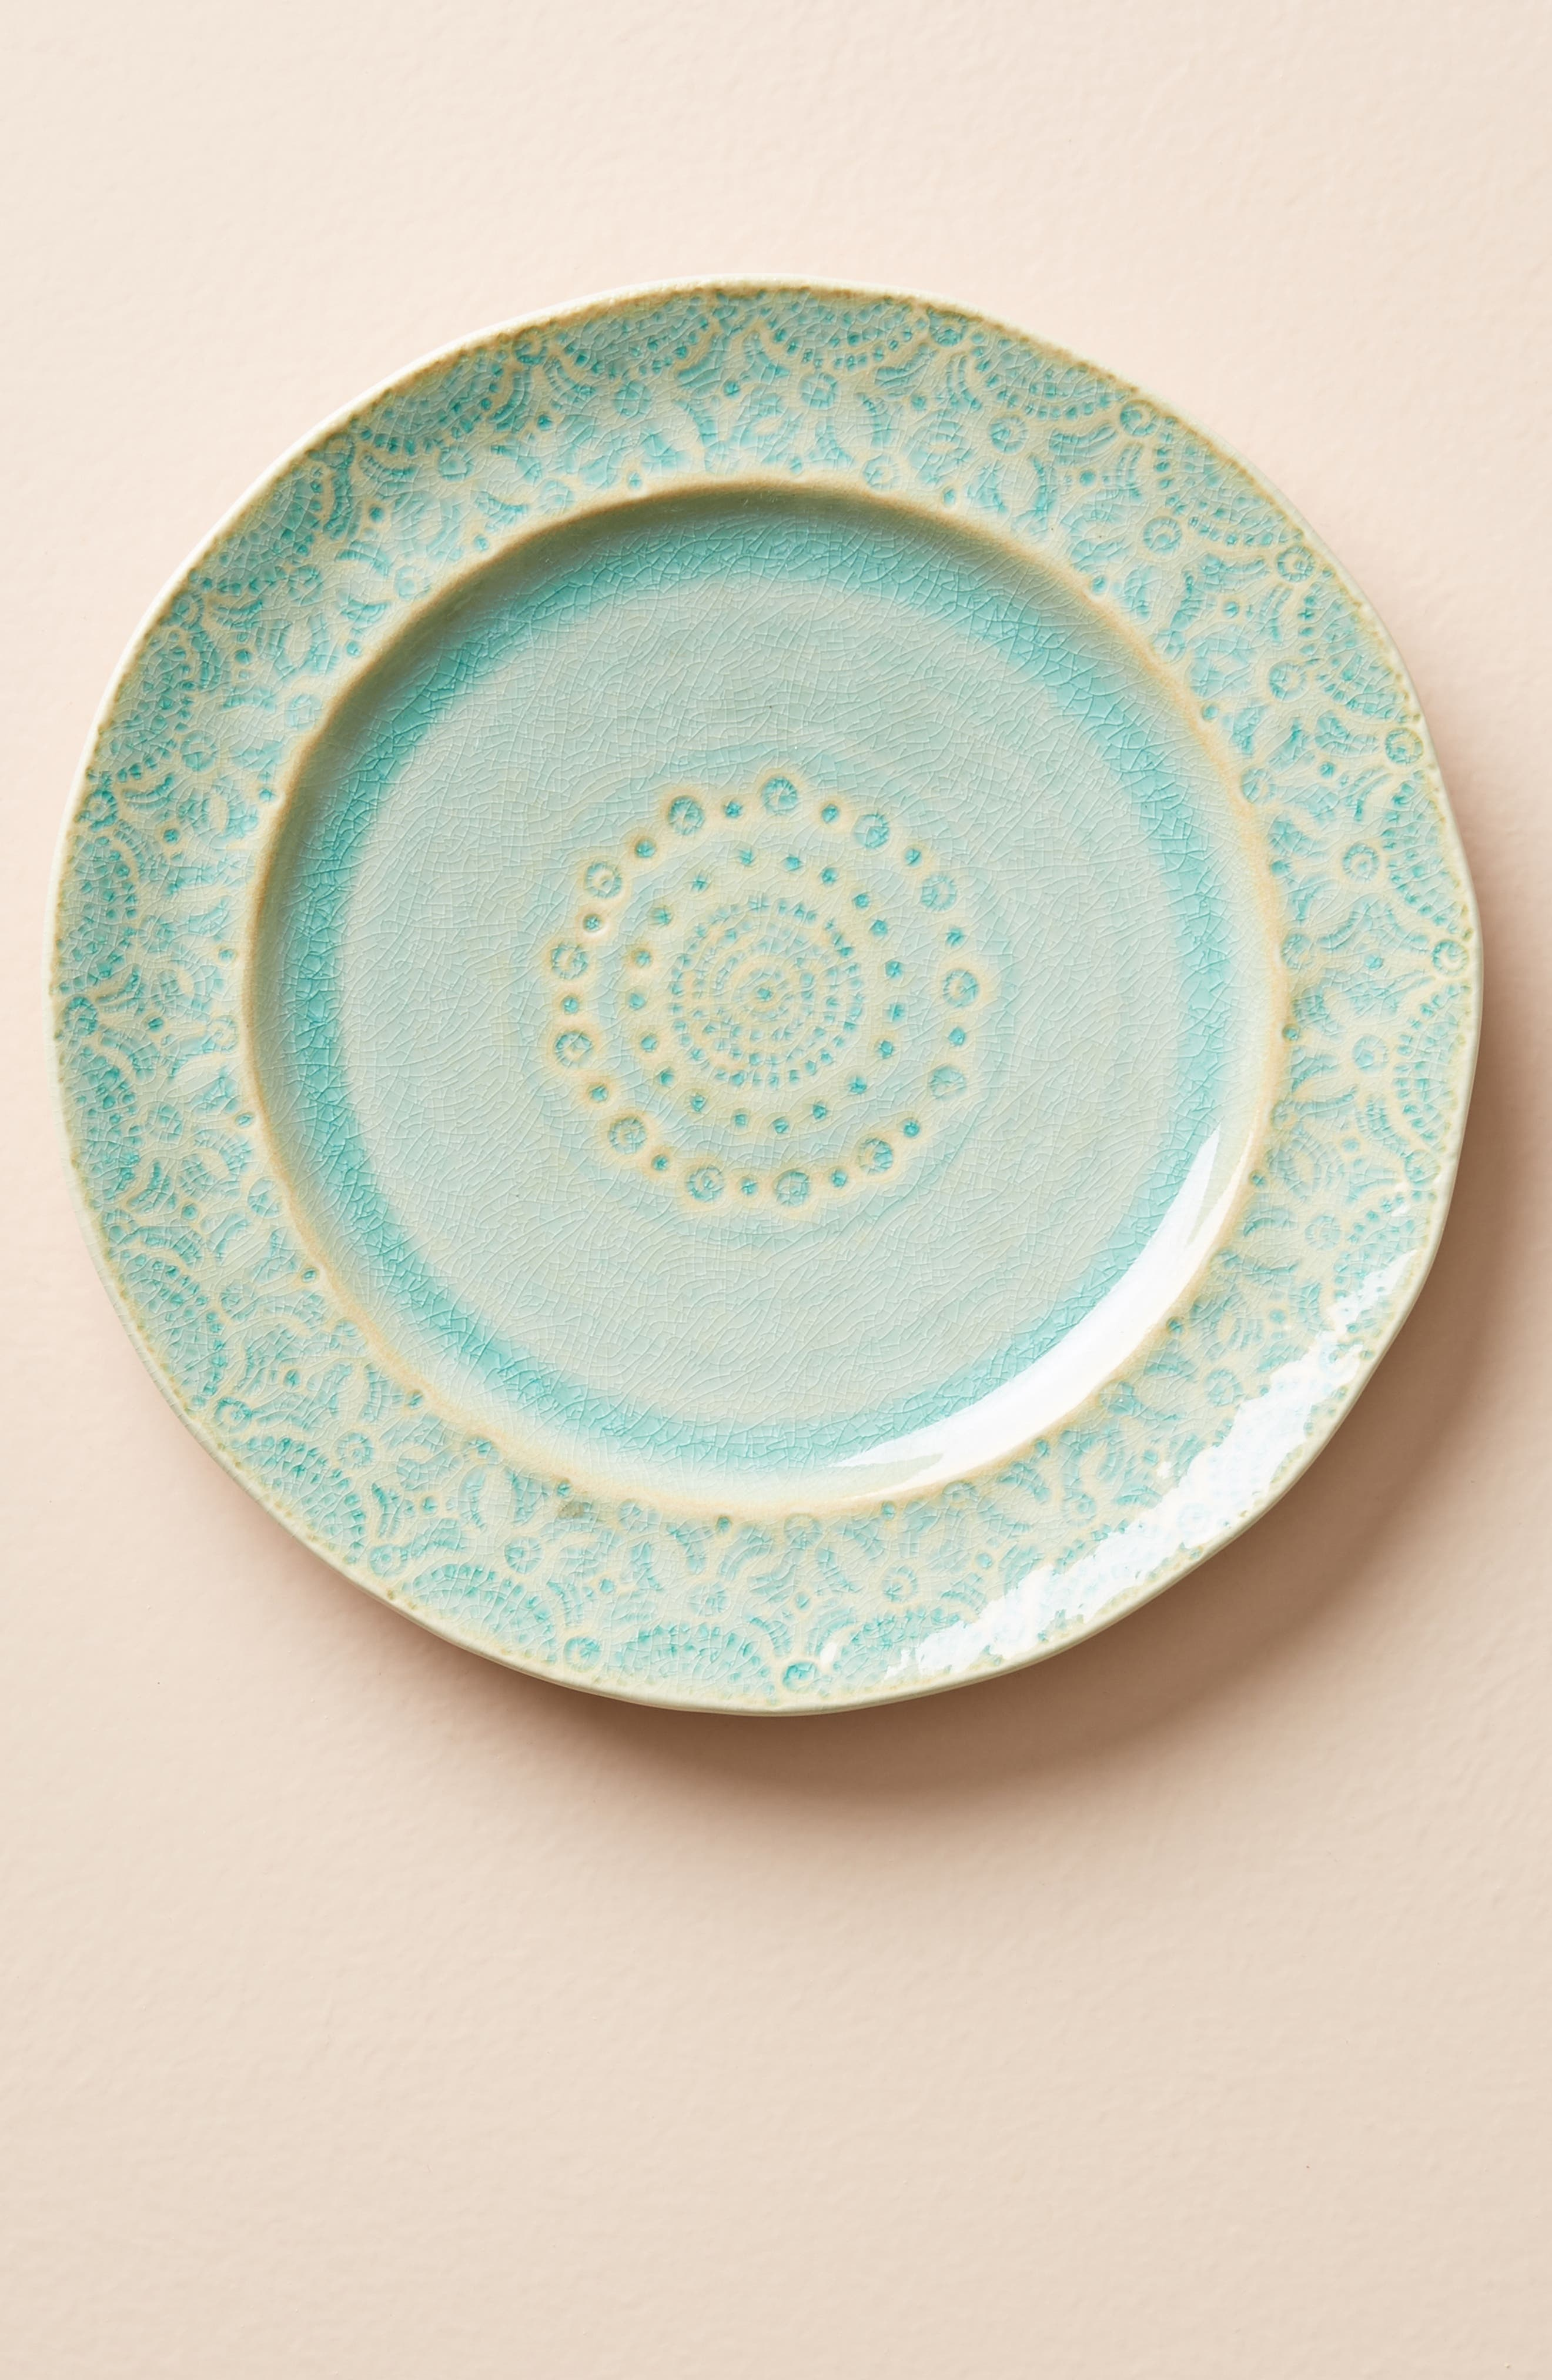 Main Image - Anthropologie Old Havana Stoneware Side Plate